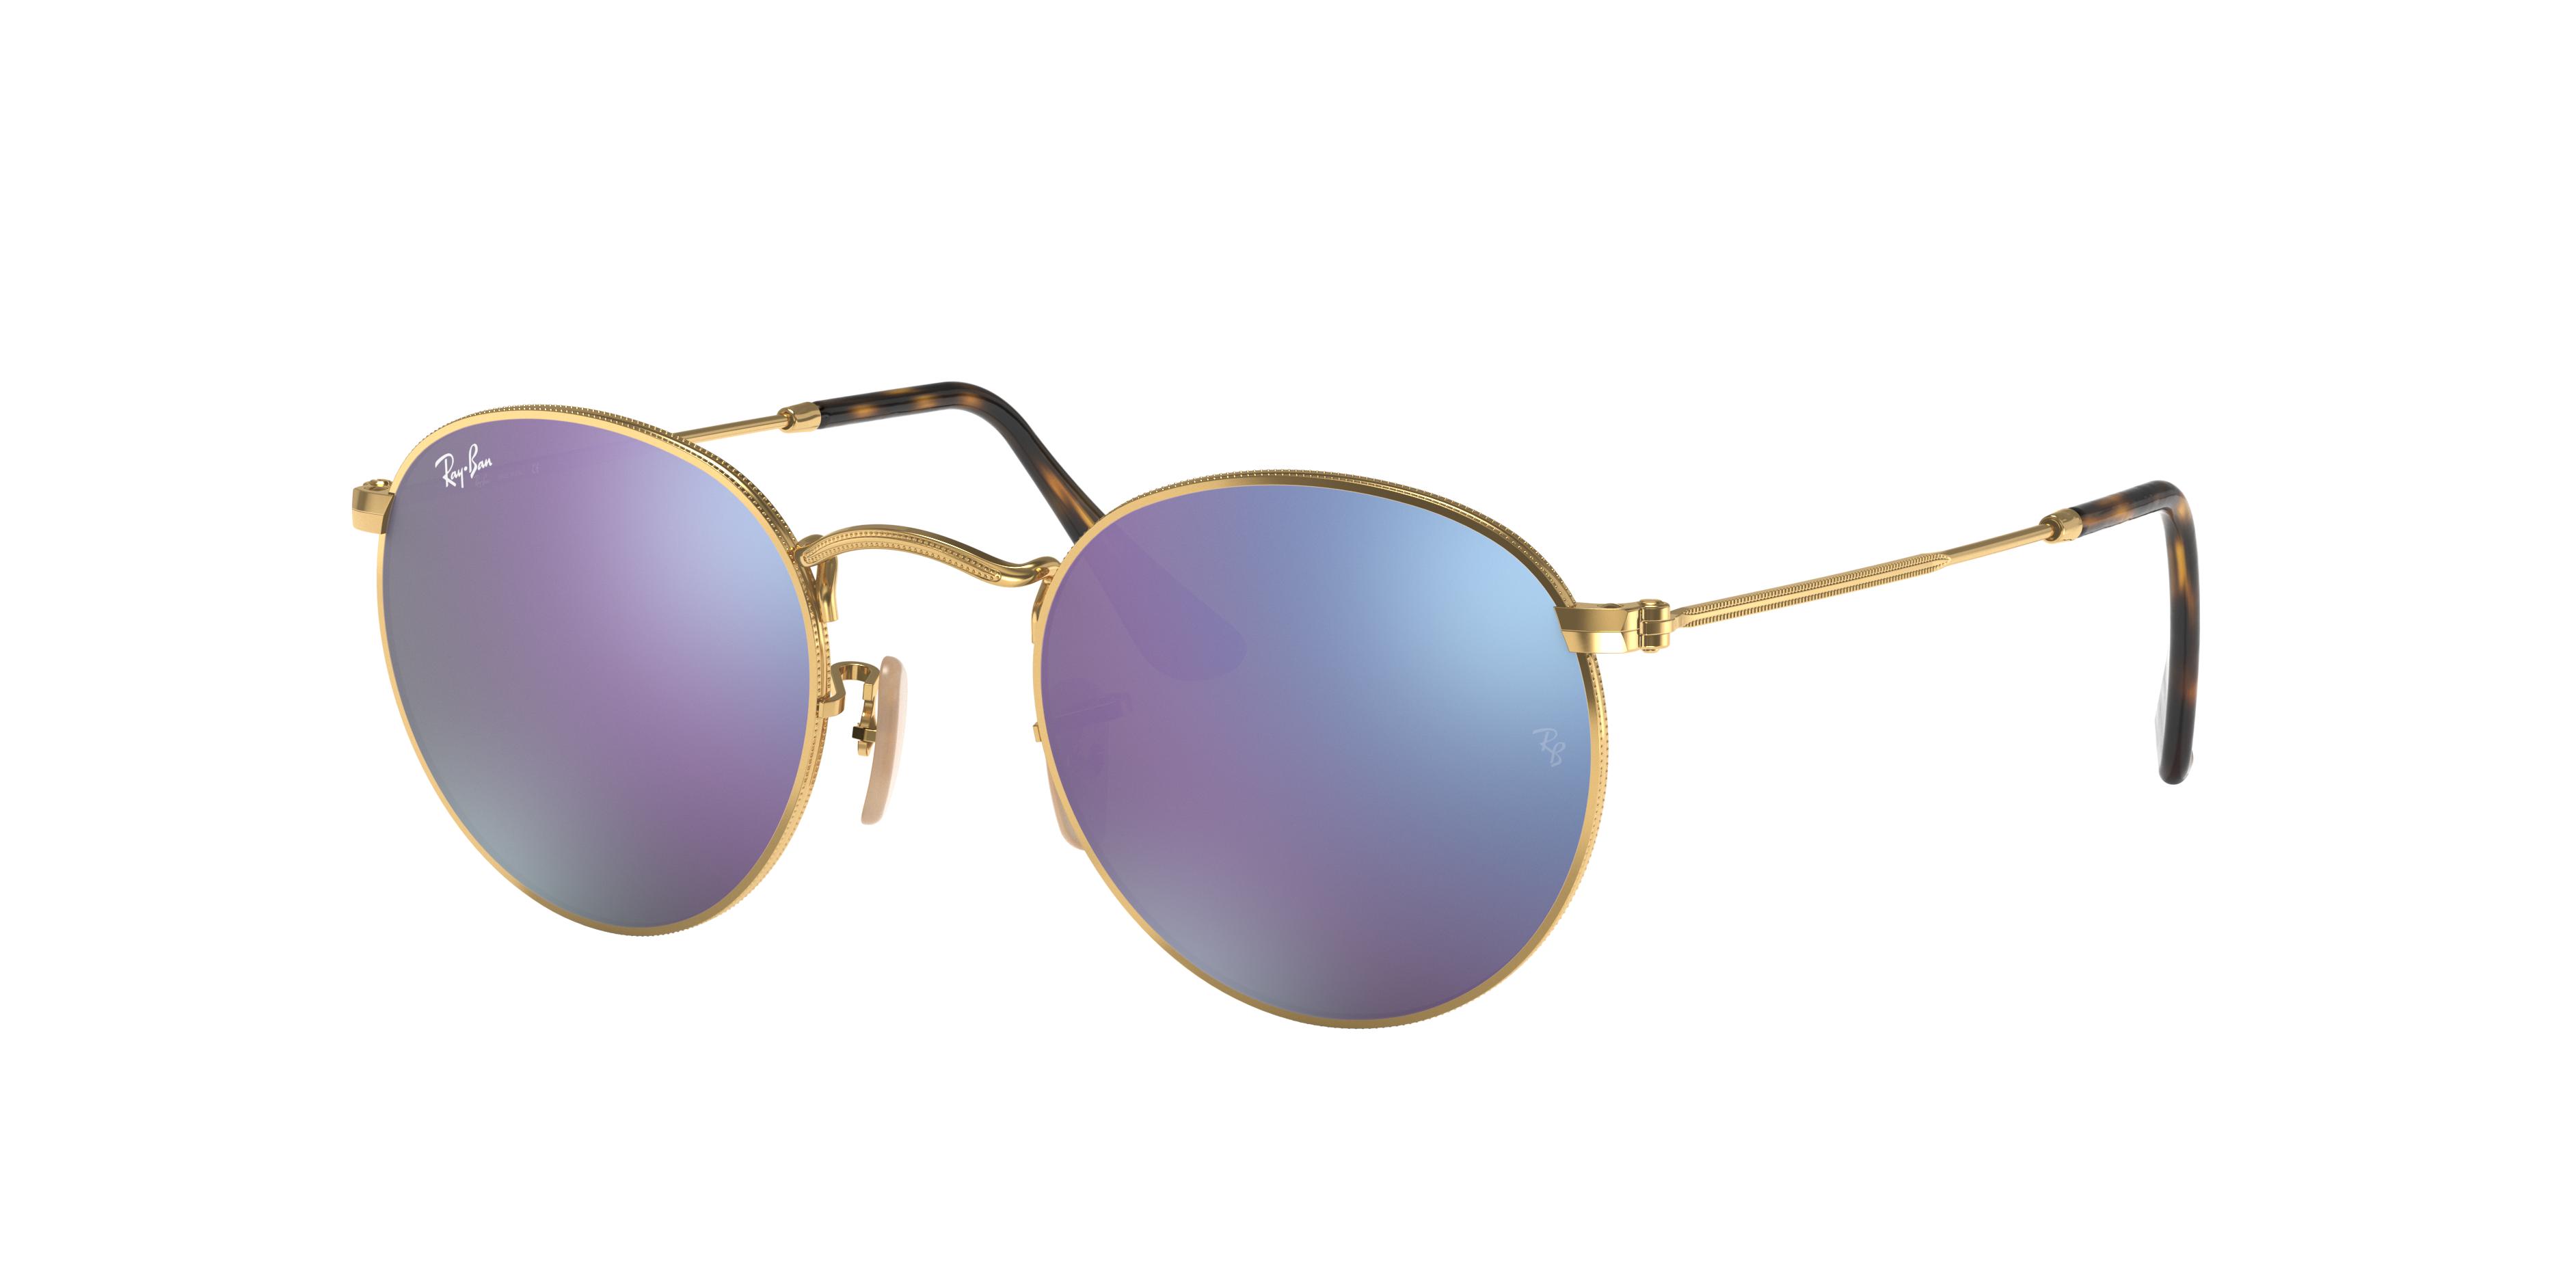 Ray-Ban Round Flat Lenses Gold, Violet Lenses - RB3447N